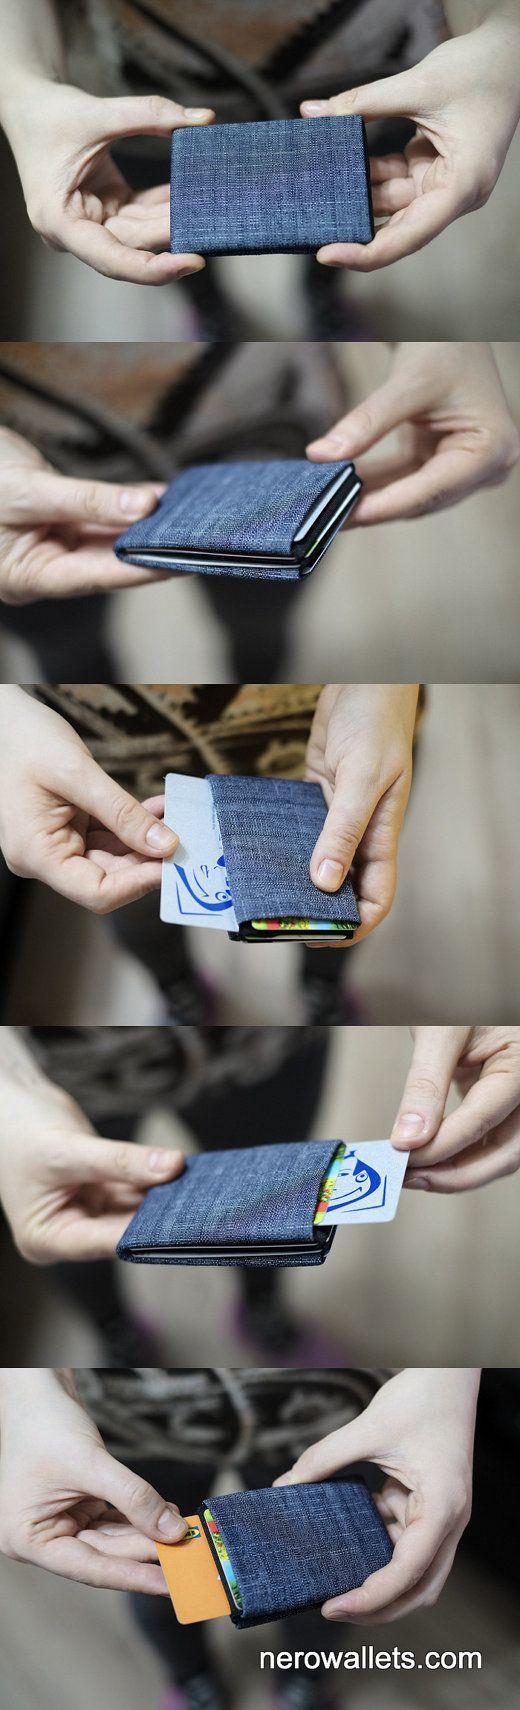 Limited Edition - Slim Wallet, Minimalist Wallet, Womens Wallet, Mens Wallet, Slim Minimalist Wallet, Modern Design - RFID Wallet